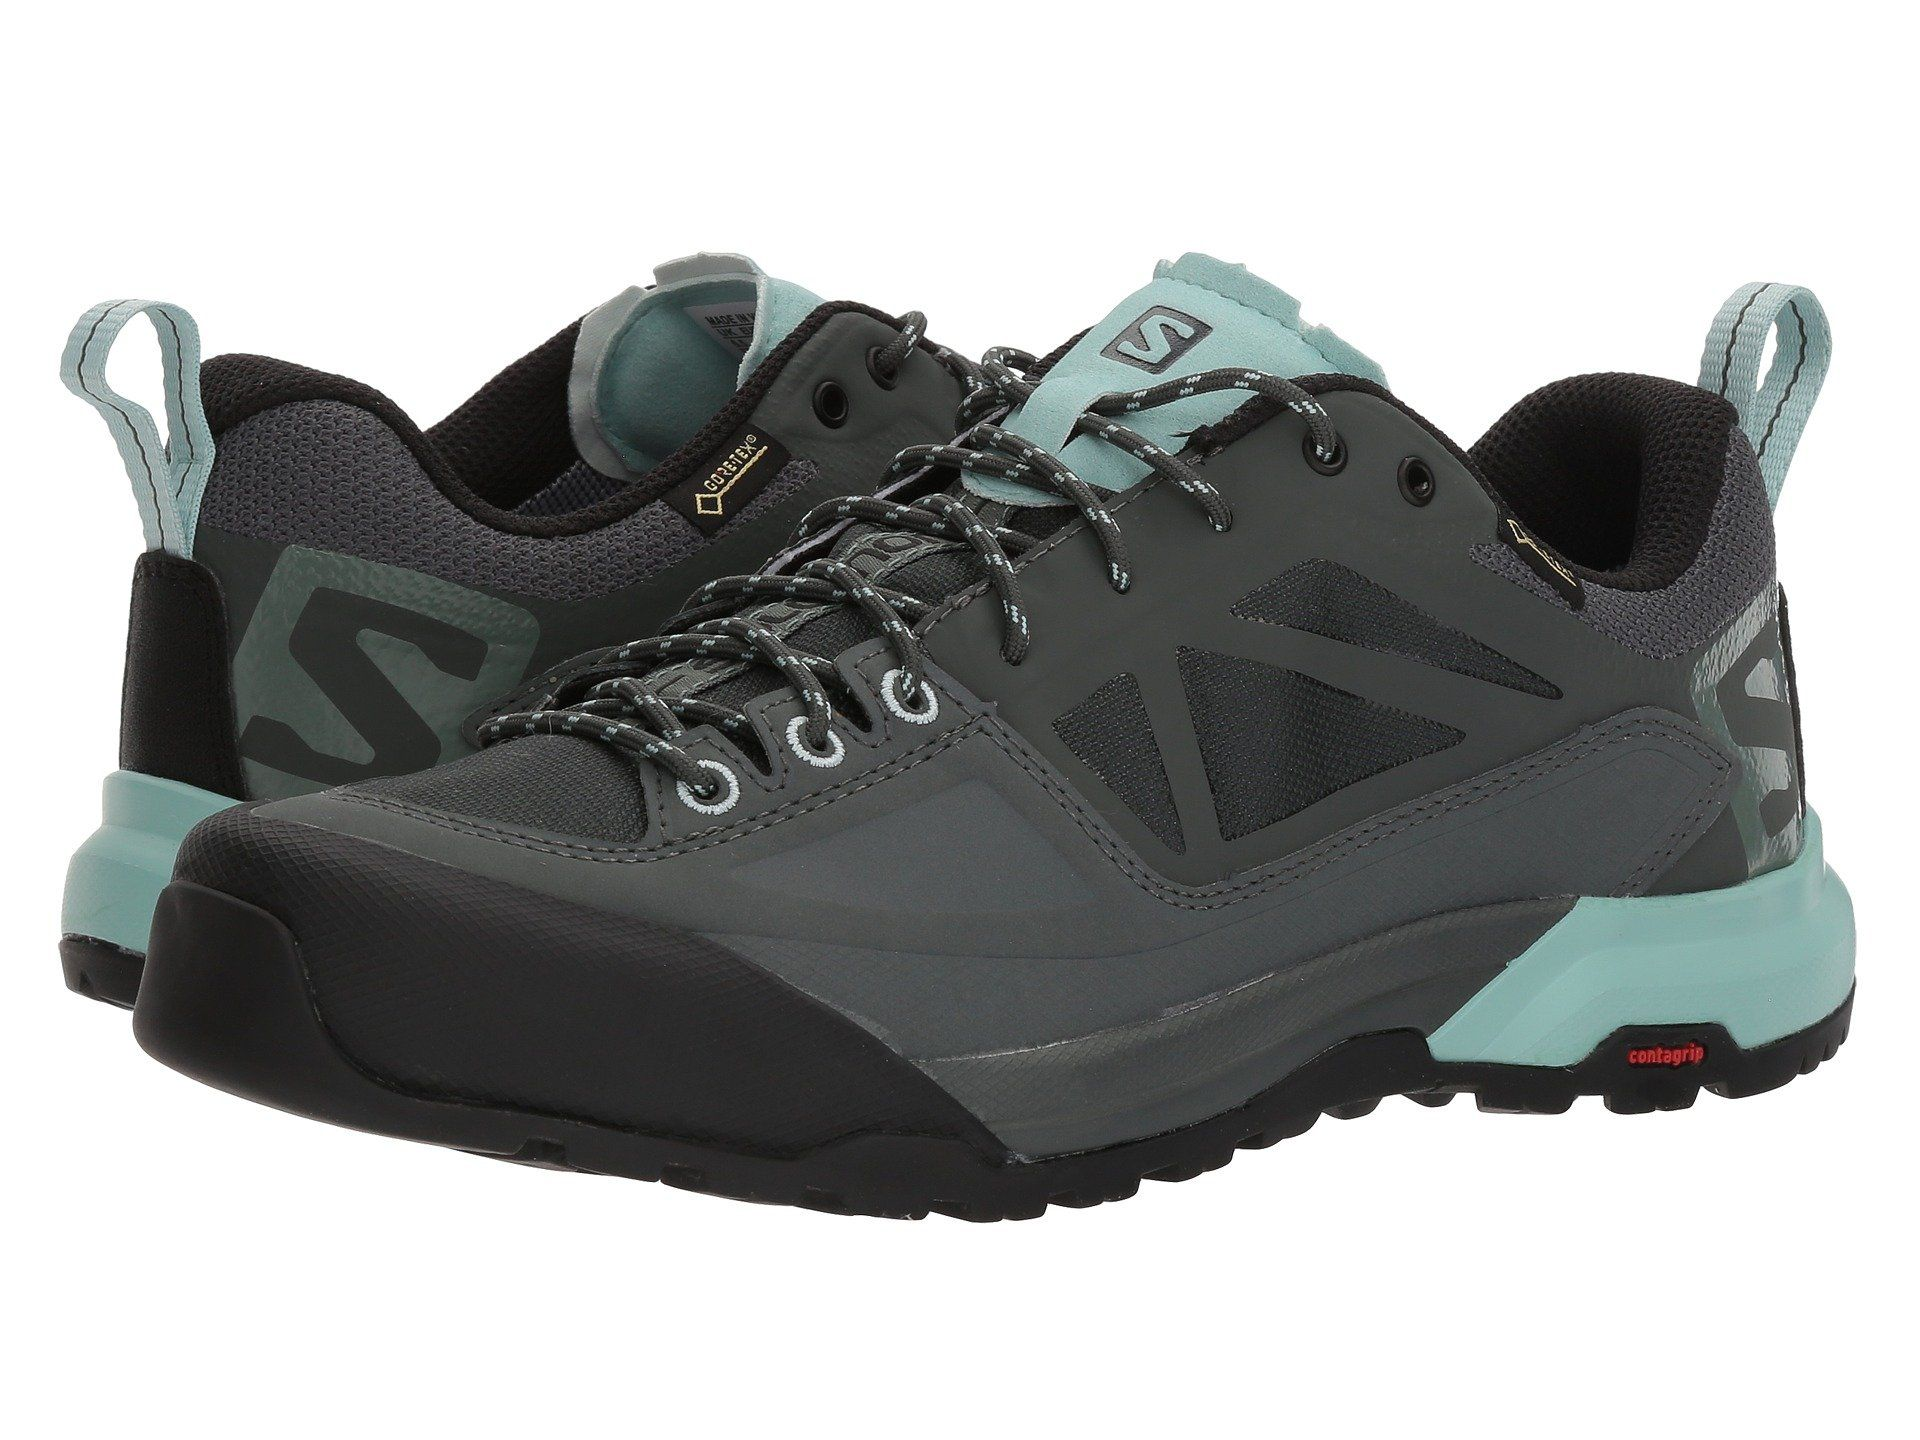 21c5b2b40f Salomon X Alp Spry GTX® | Shoes! | Shoes, On shoes, Sneakers